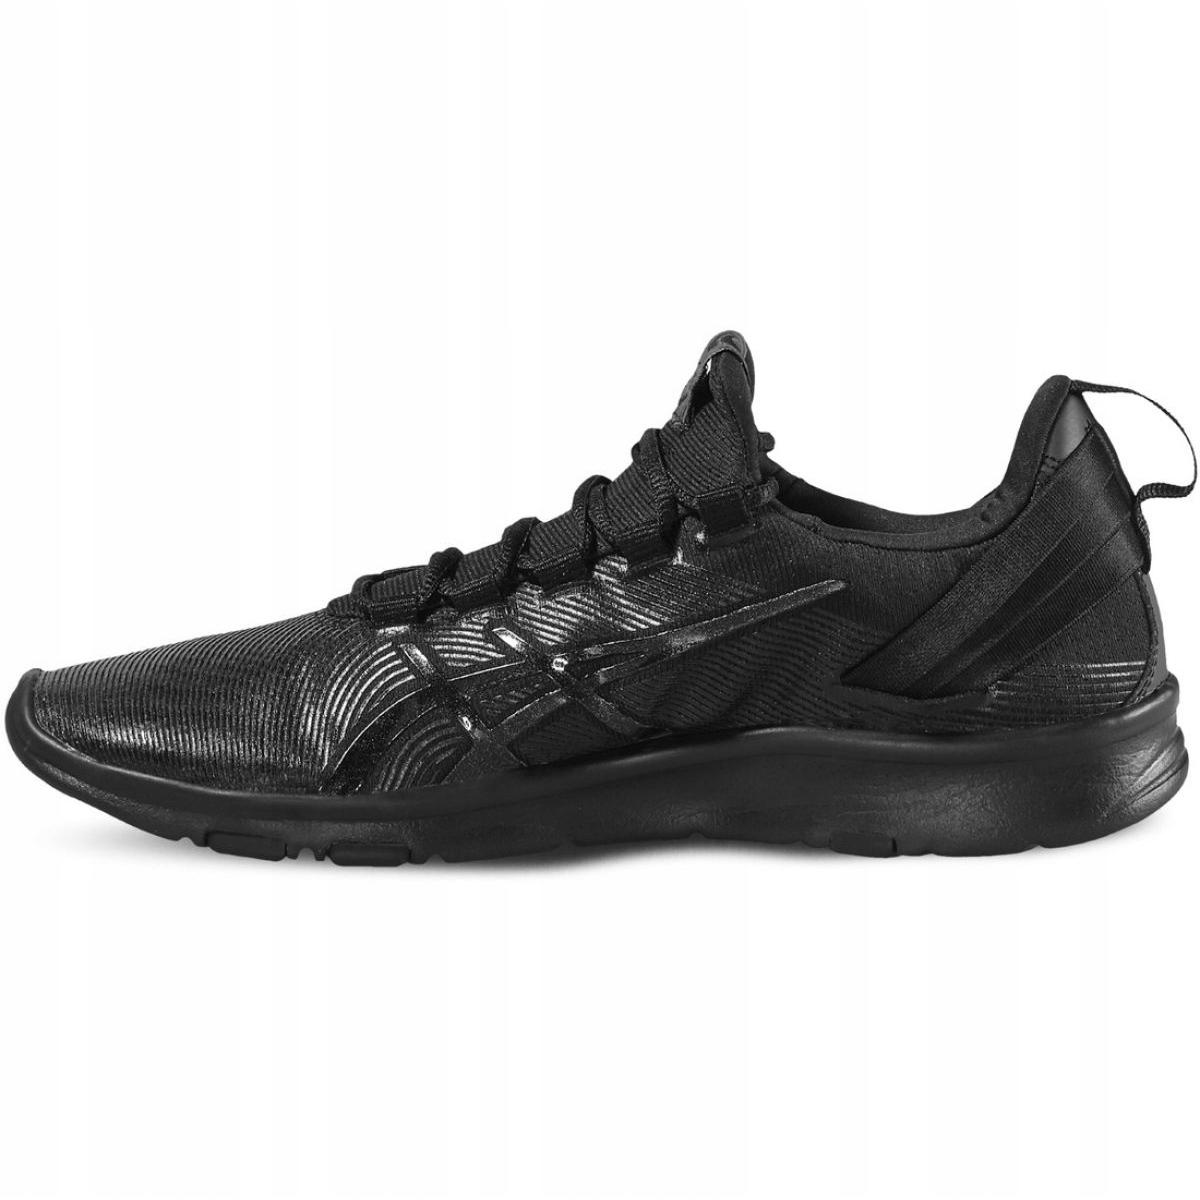 Asics Gel Fit Sana 2 shoes in S561N-9099 black